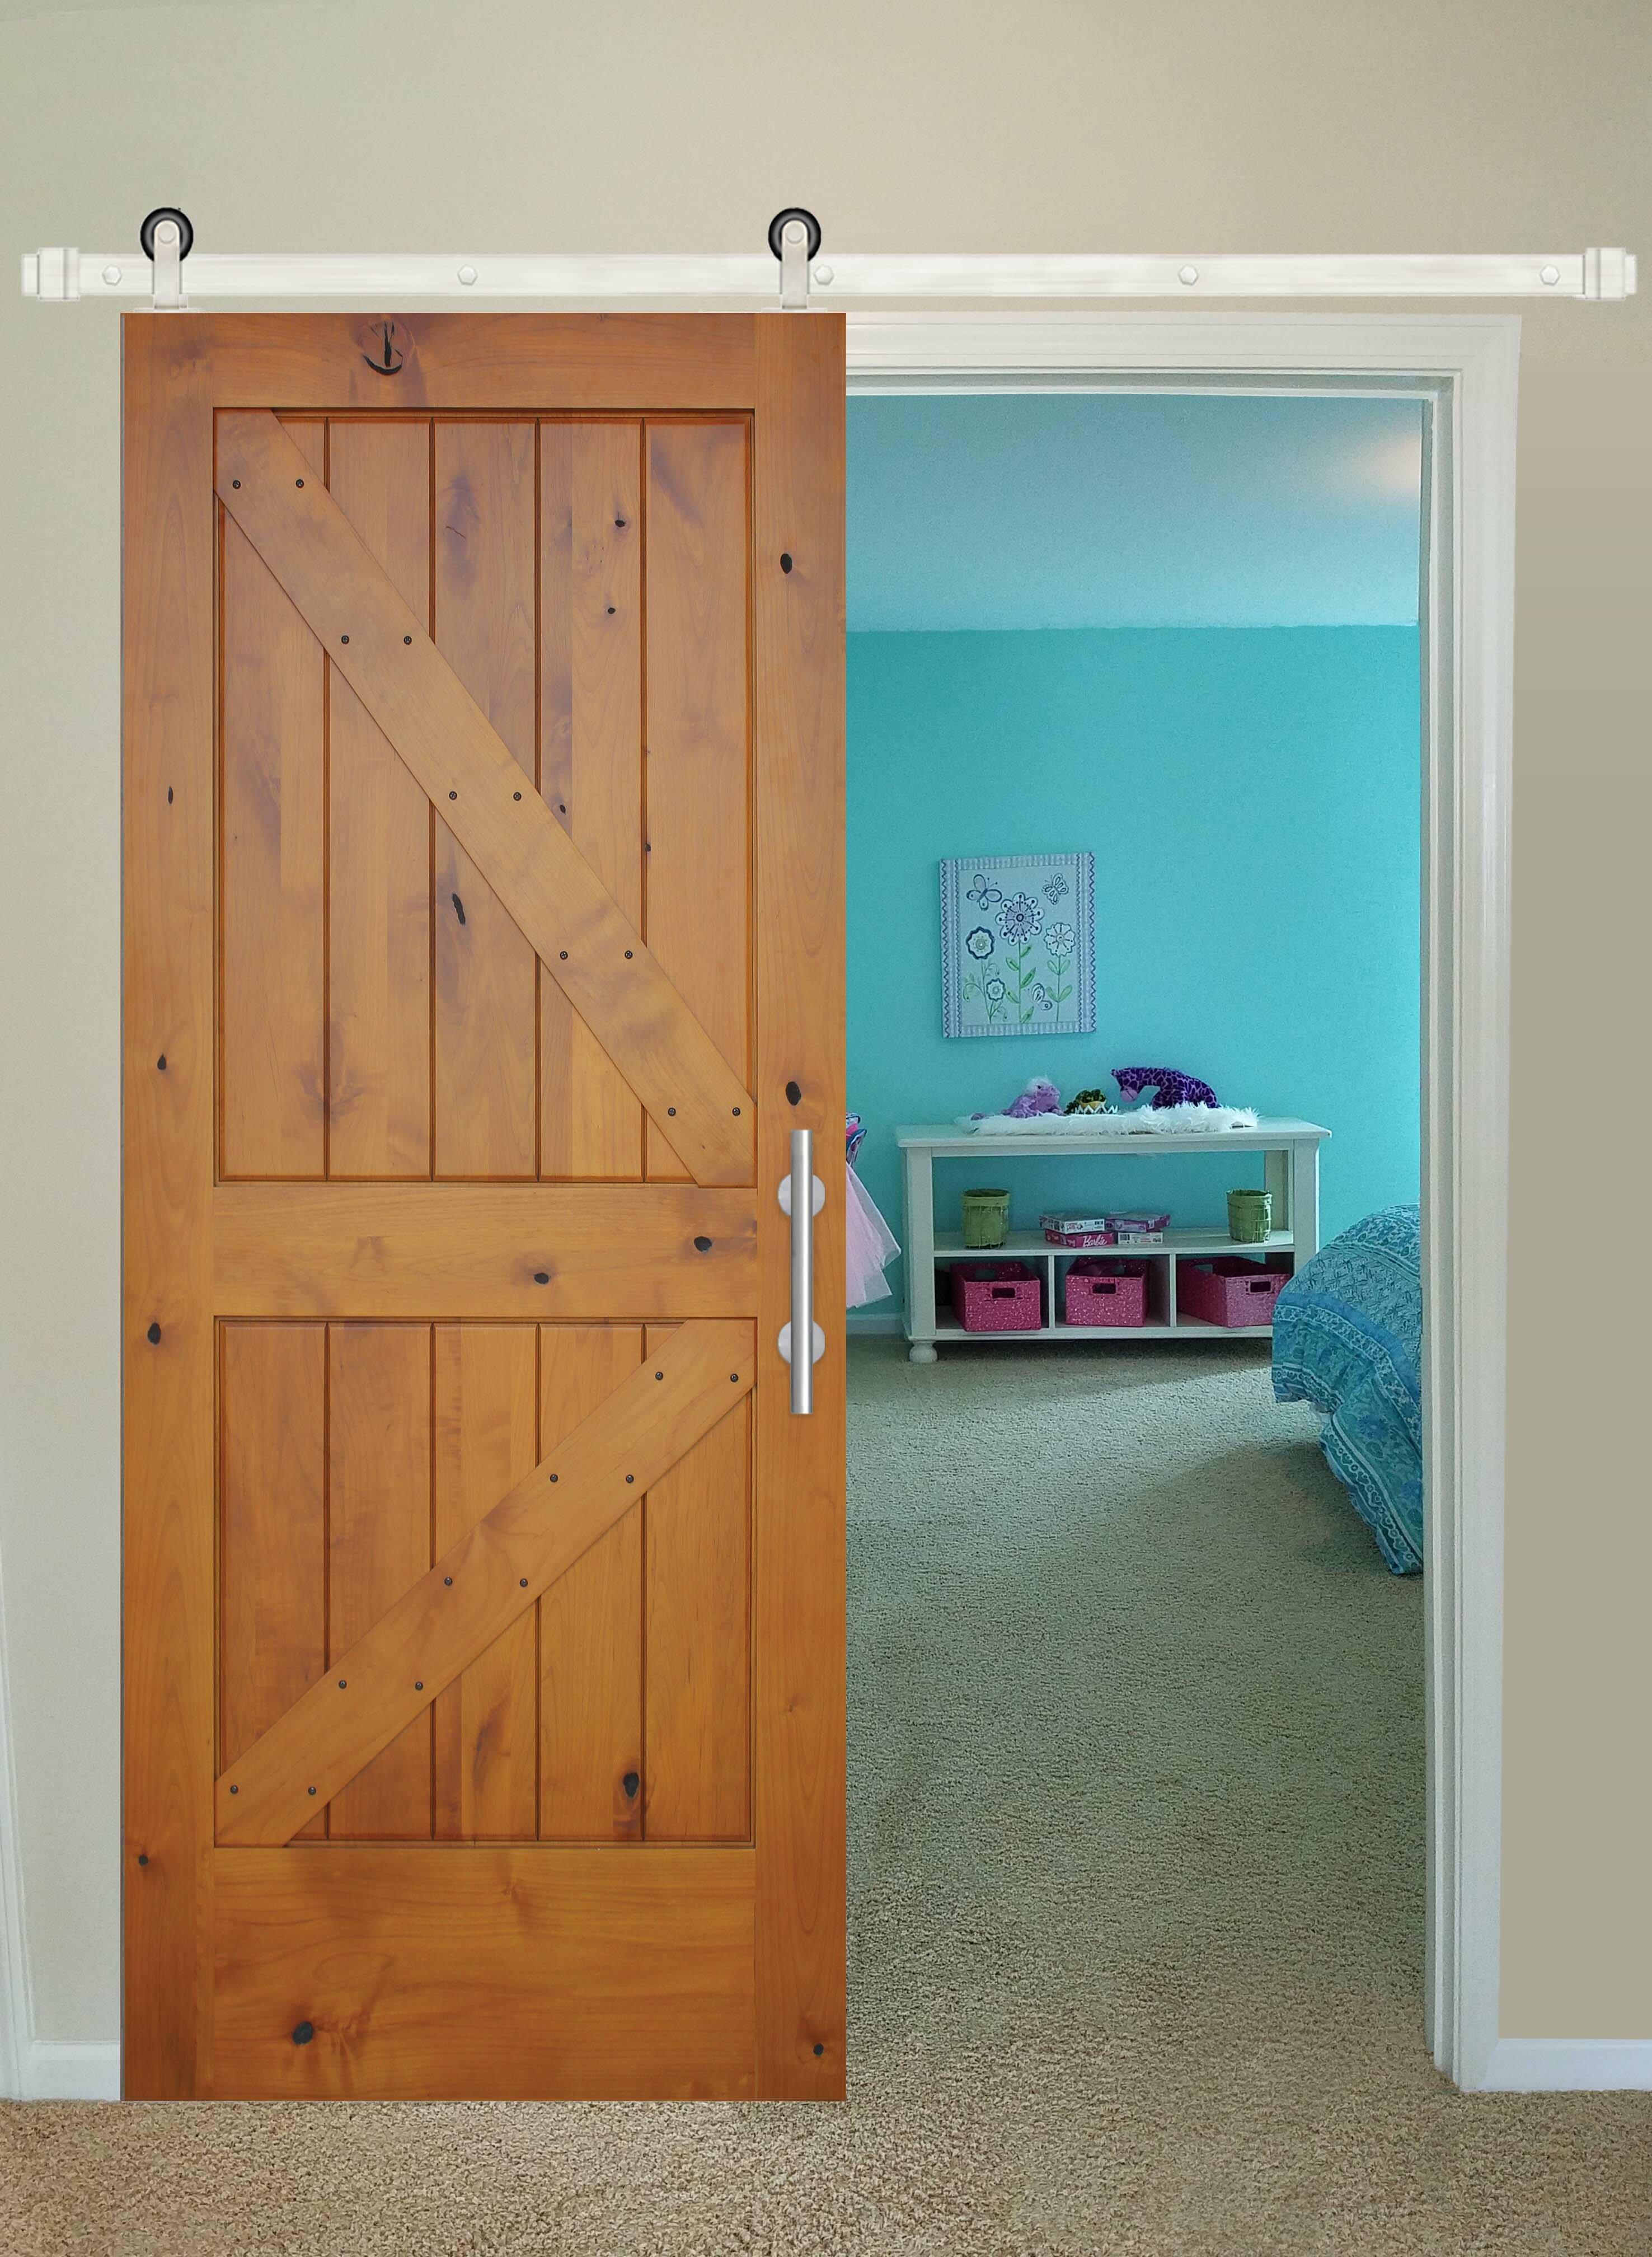 Creativeentryways Paneled Wood Finish Rustic Knotty Alder Barn Door With Installation Hardware Kit Wayfair